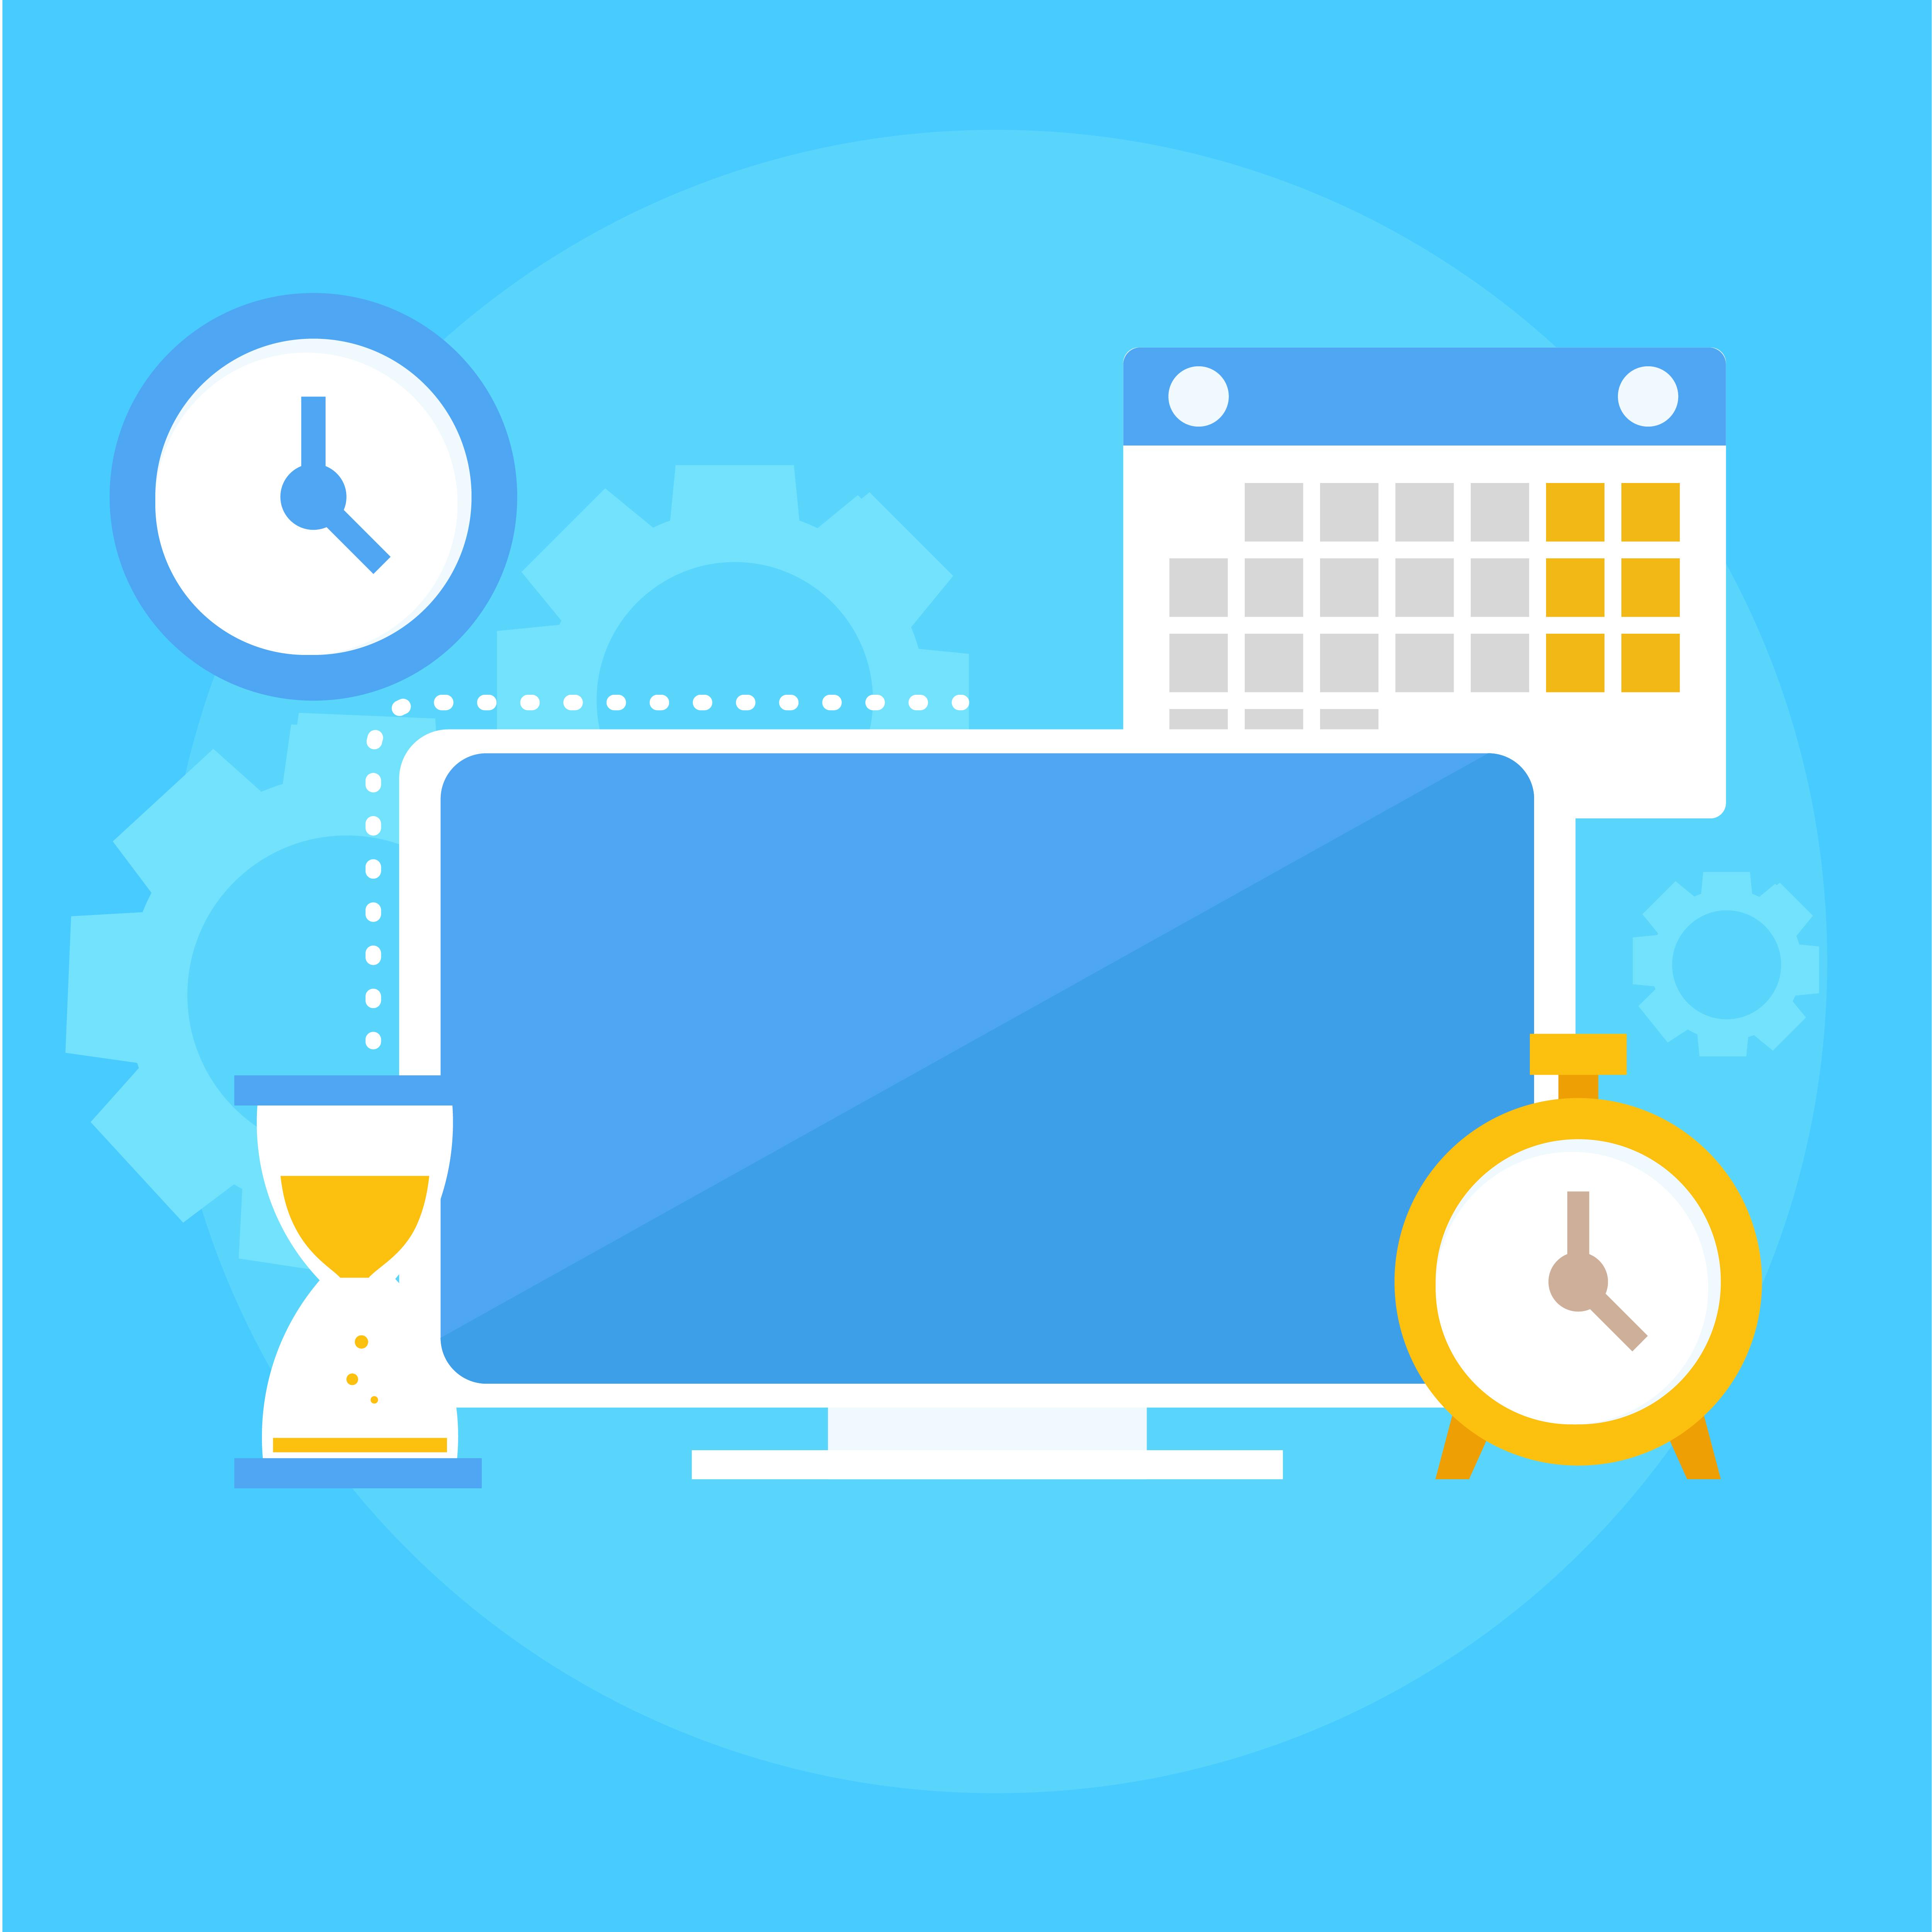 Time Management Banner Computer Calendar Alarm Clock Hourglass Vector Flat Illustration Download Free Vectors Clipart Graphics Vector Art